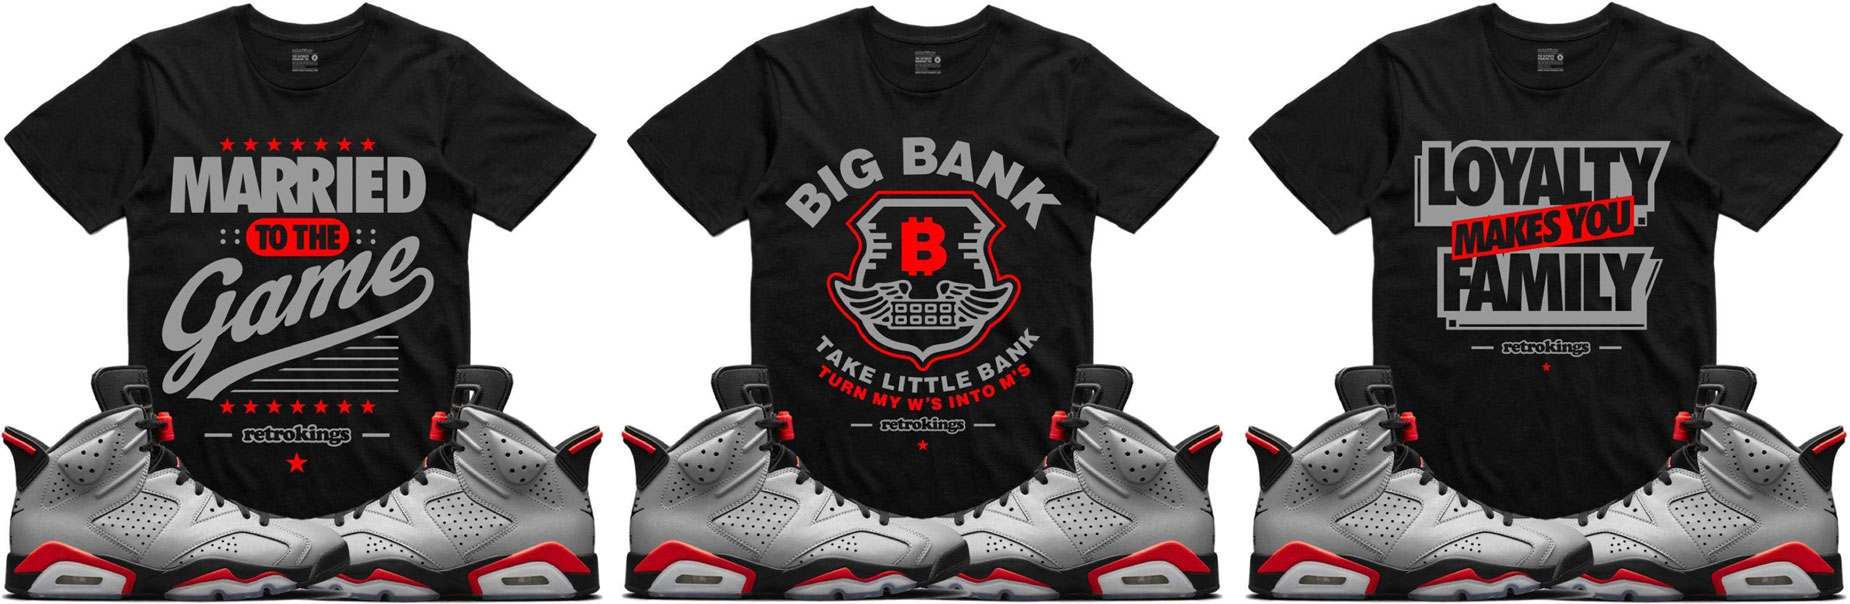 jordan-6-reflections-of-a-champion-sneaker-tees-shirts